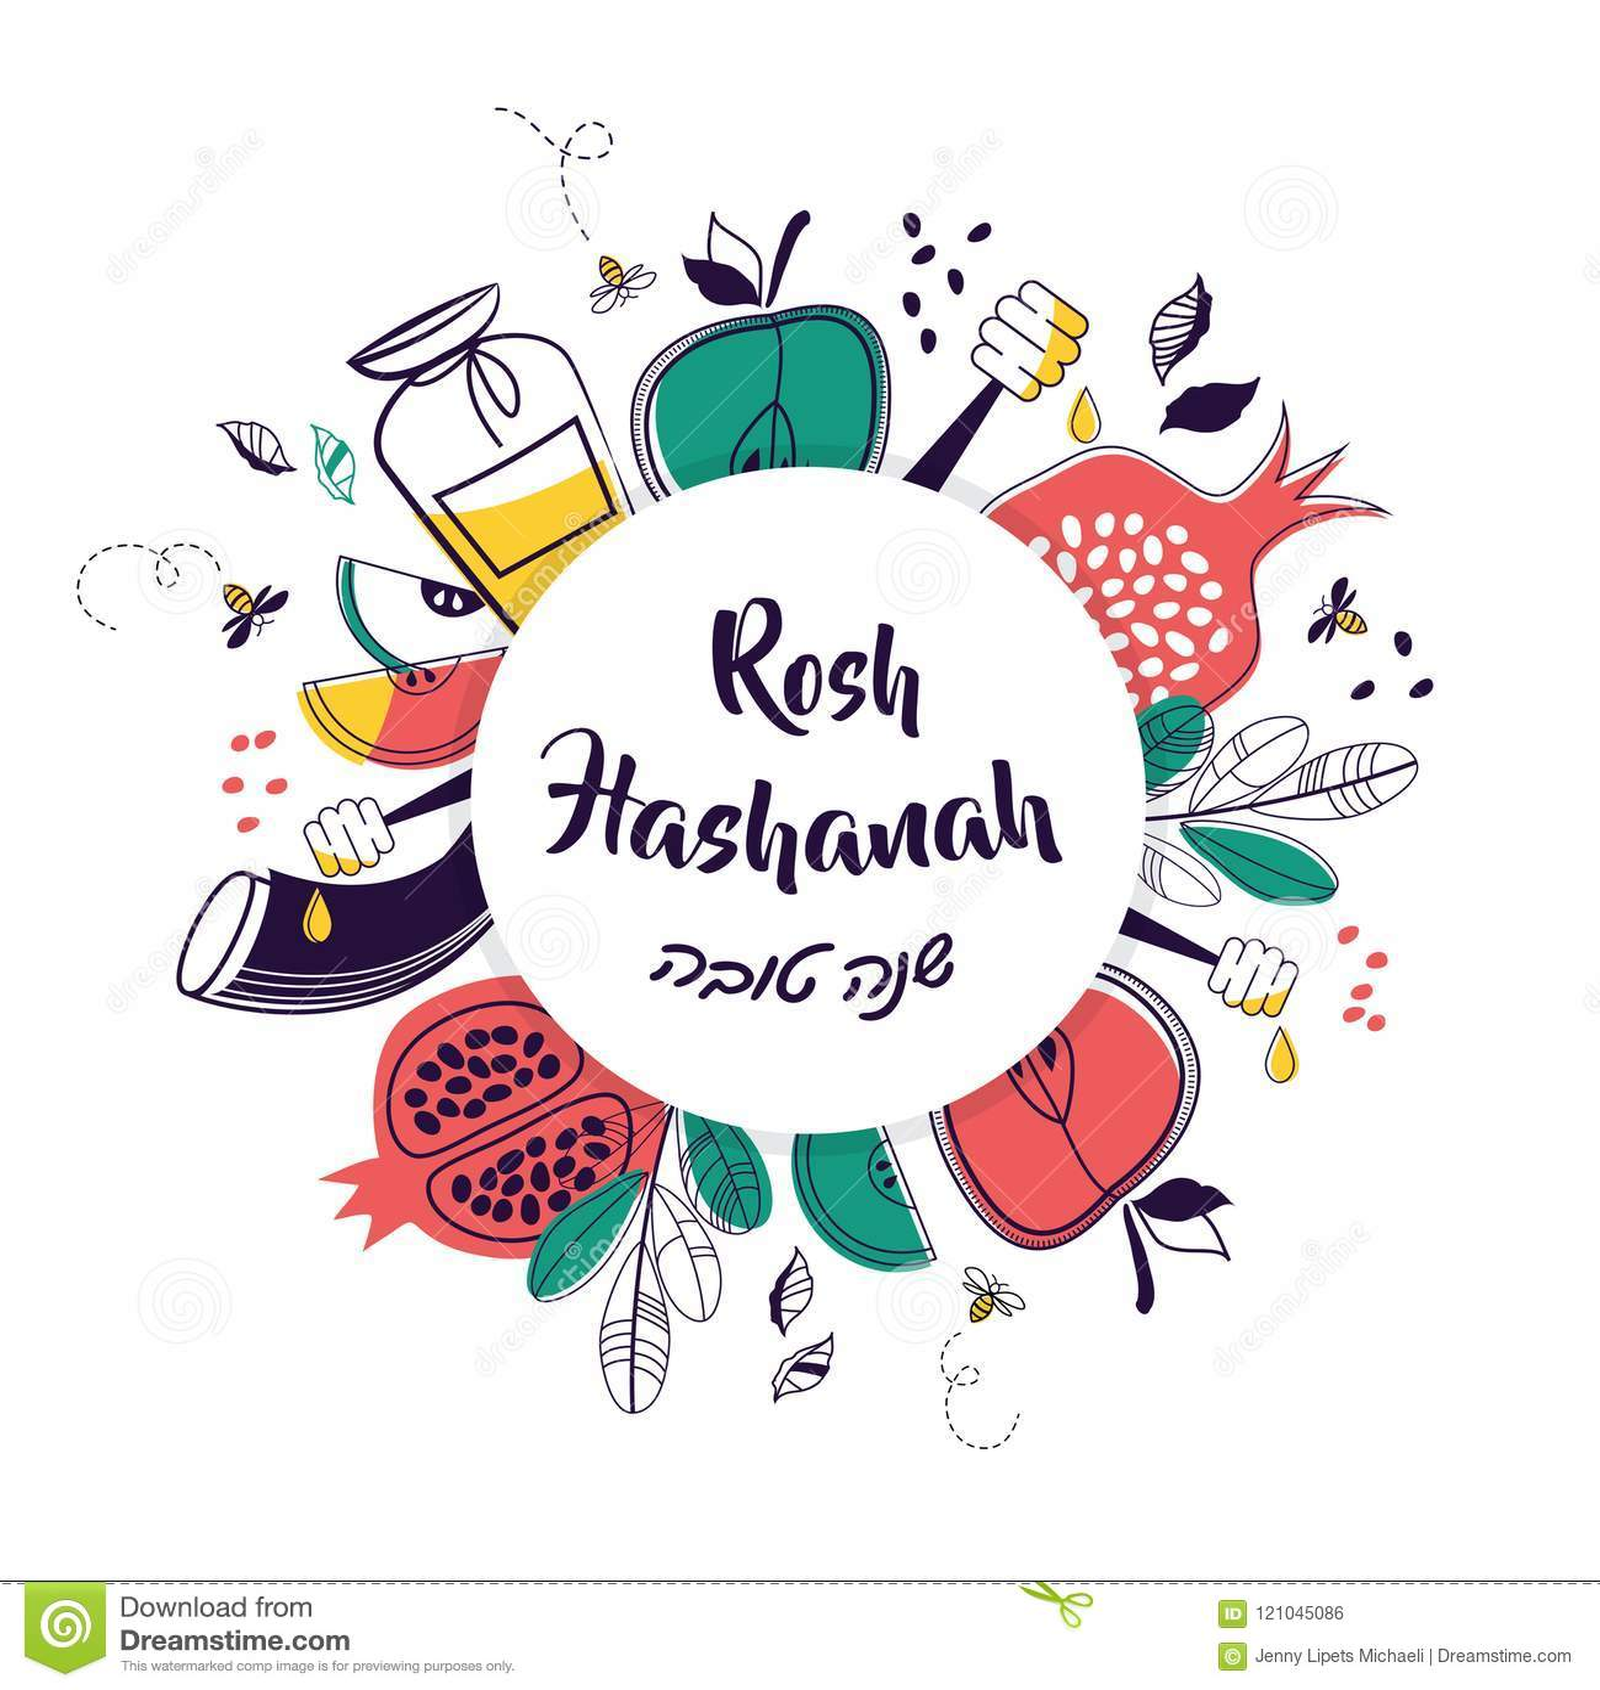 Greeting Card With Symbols Of Jewish Holiday Rosh Hashana New Year